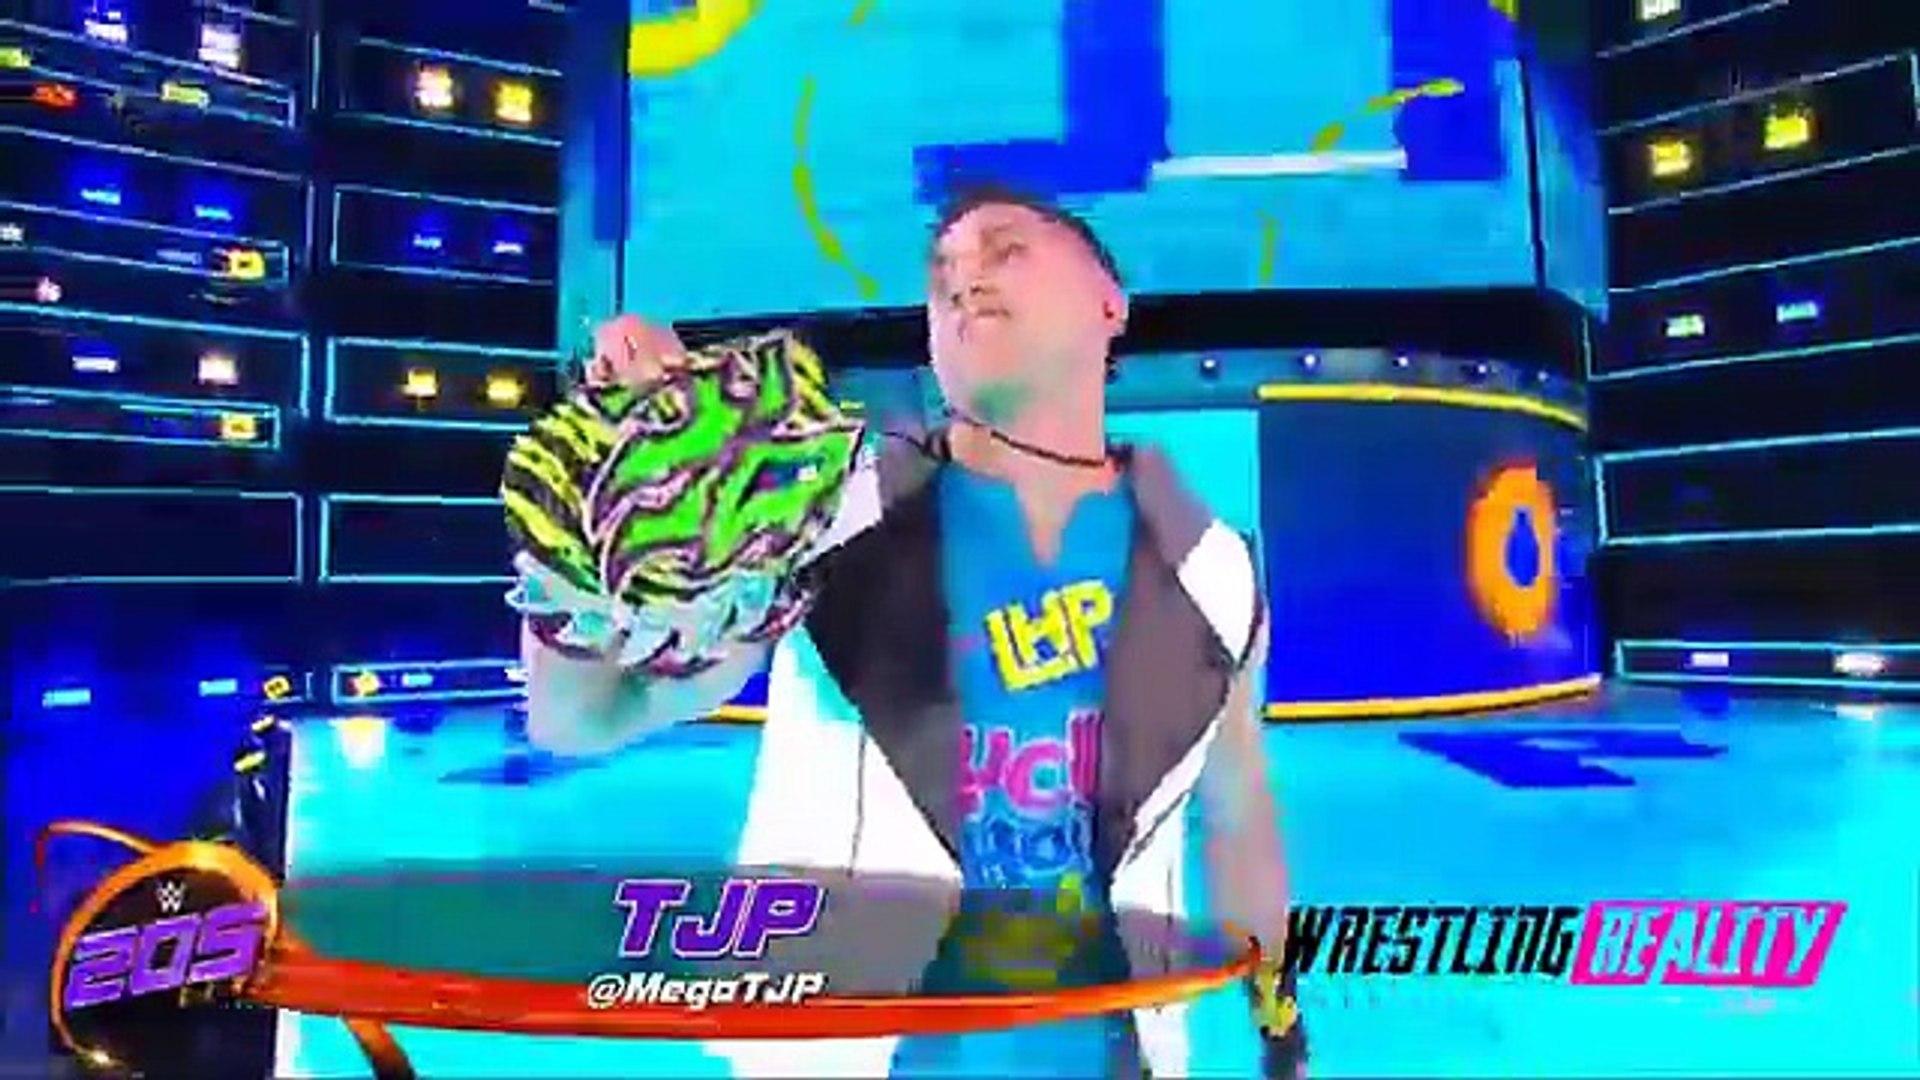 WWE 205 Highlights 17th October 2018 HD - WWE 205 Highlights 10/17/18 HD